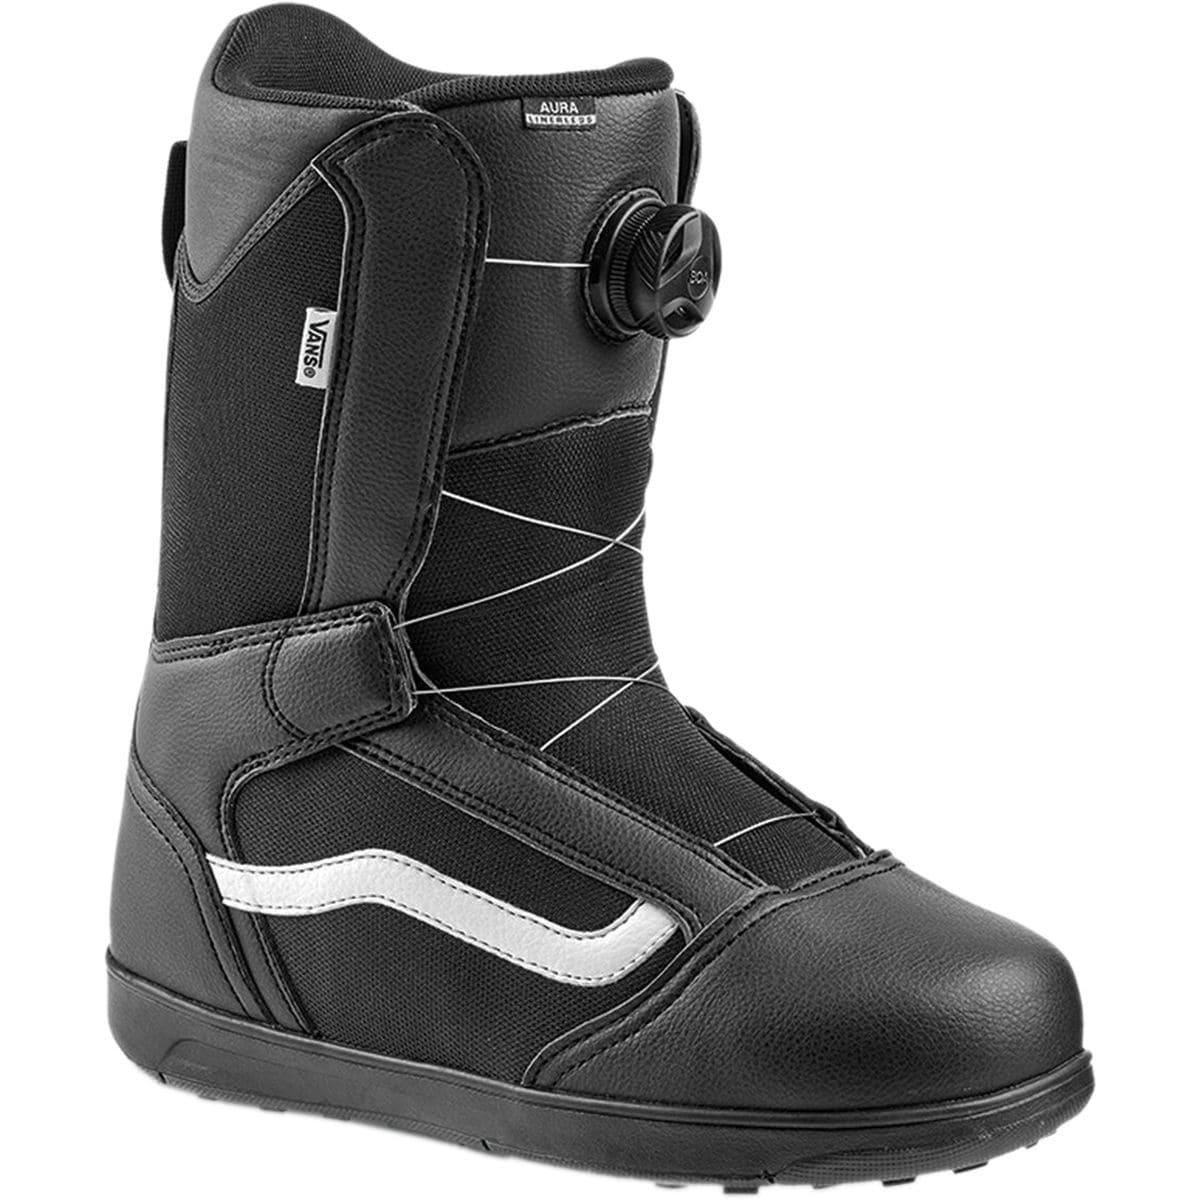 Vans Aura Linerless Boa Snowboard Boot Men's